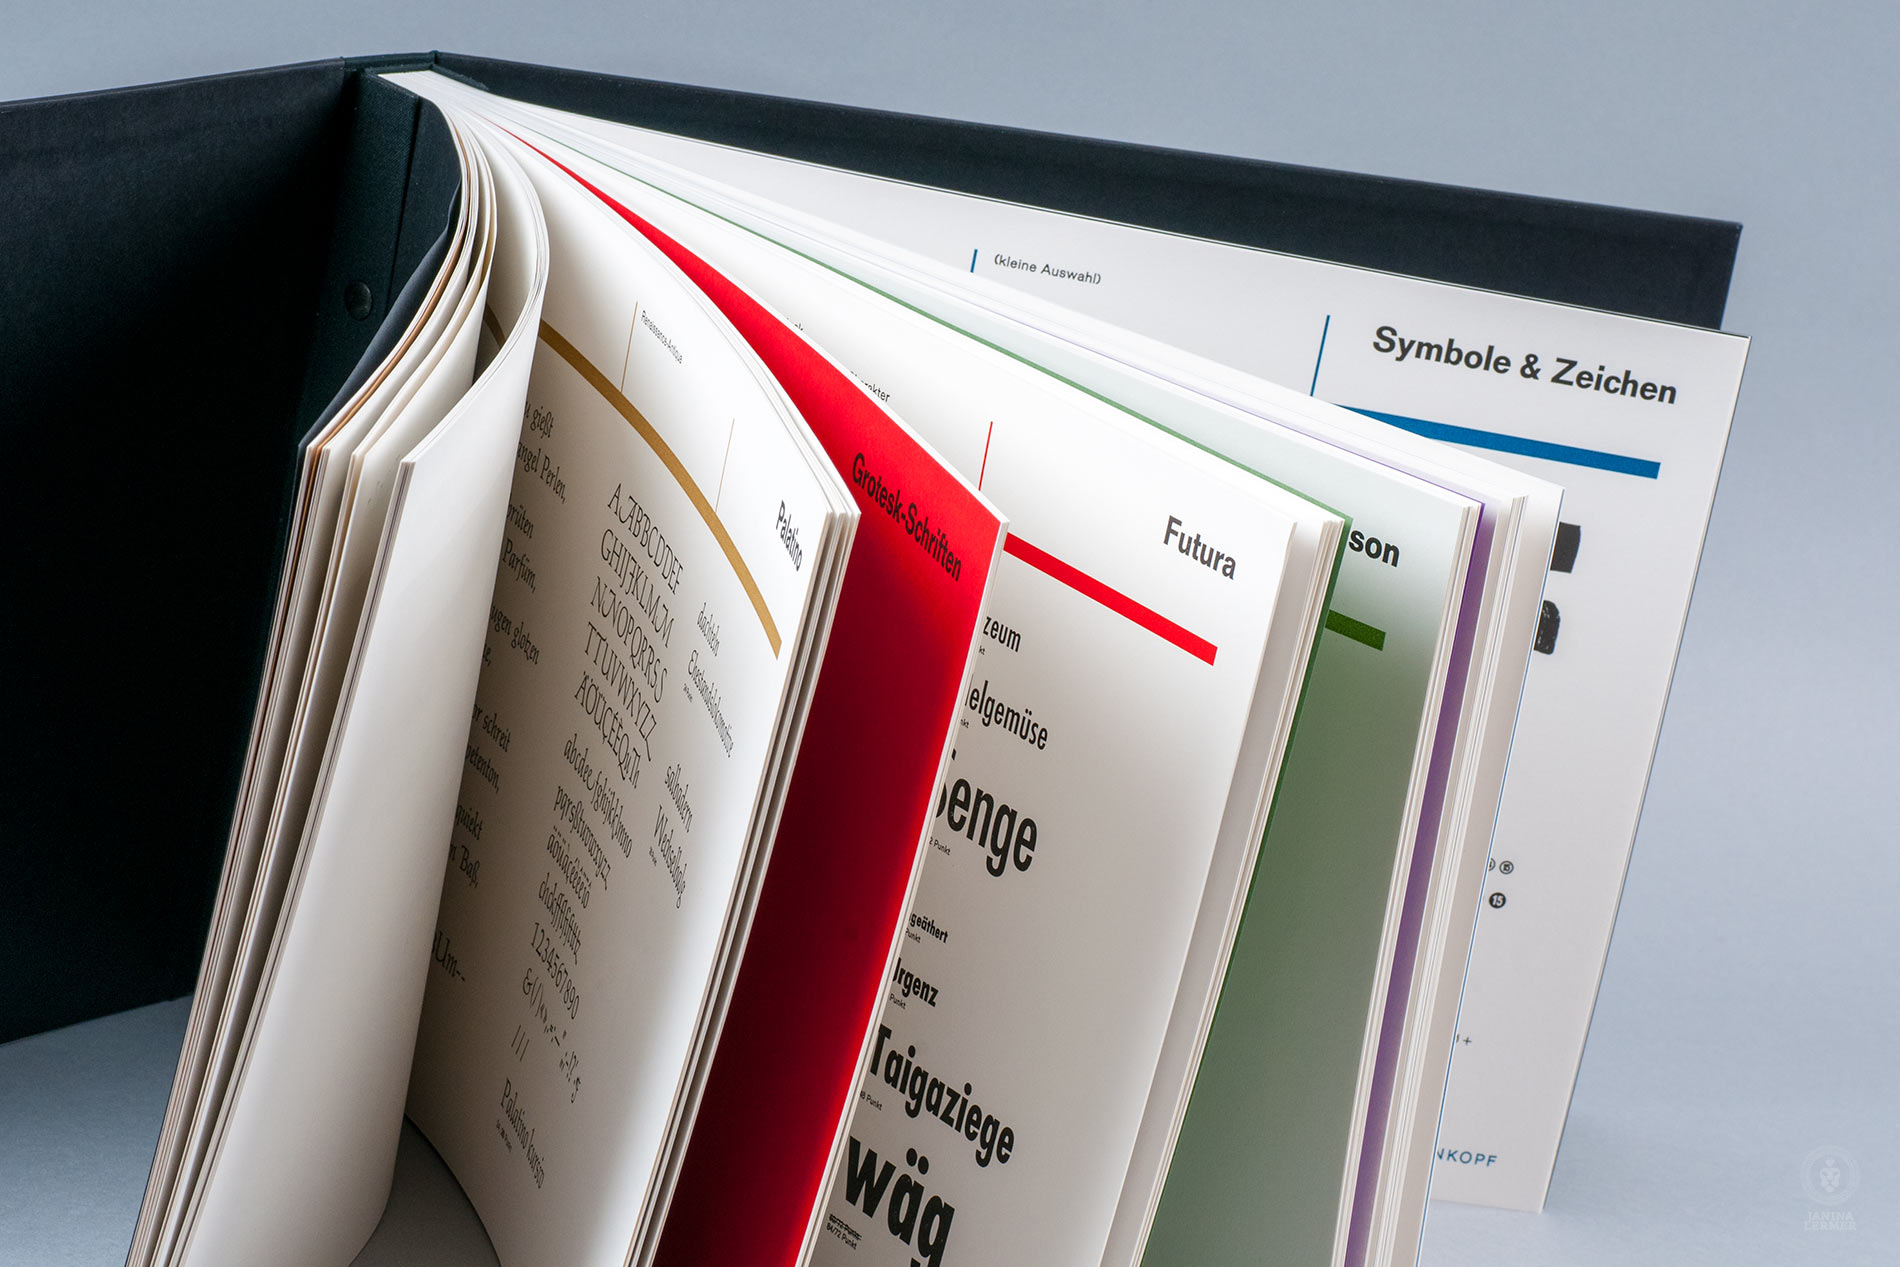 Janina-Lermer-Buchgestaltung-Magazingestaltung-Editorialdesign-Bleisatz-Metaltype-Overview-Handgedruckt-Handprinted-Werkstatt-Fliegenkopf